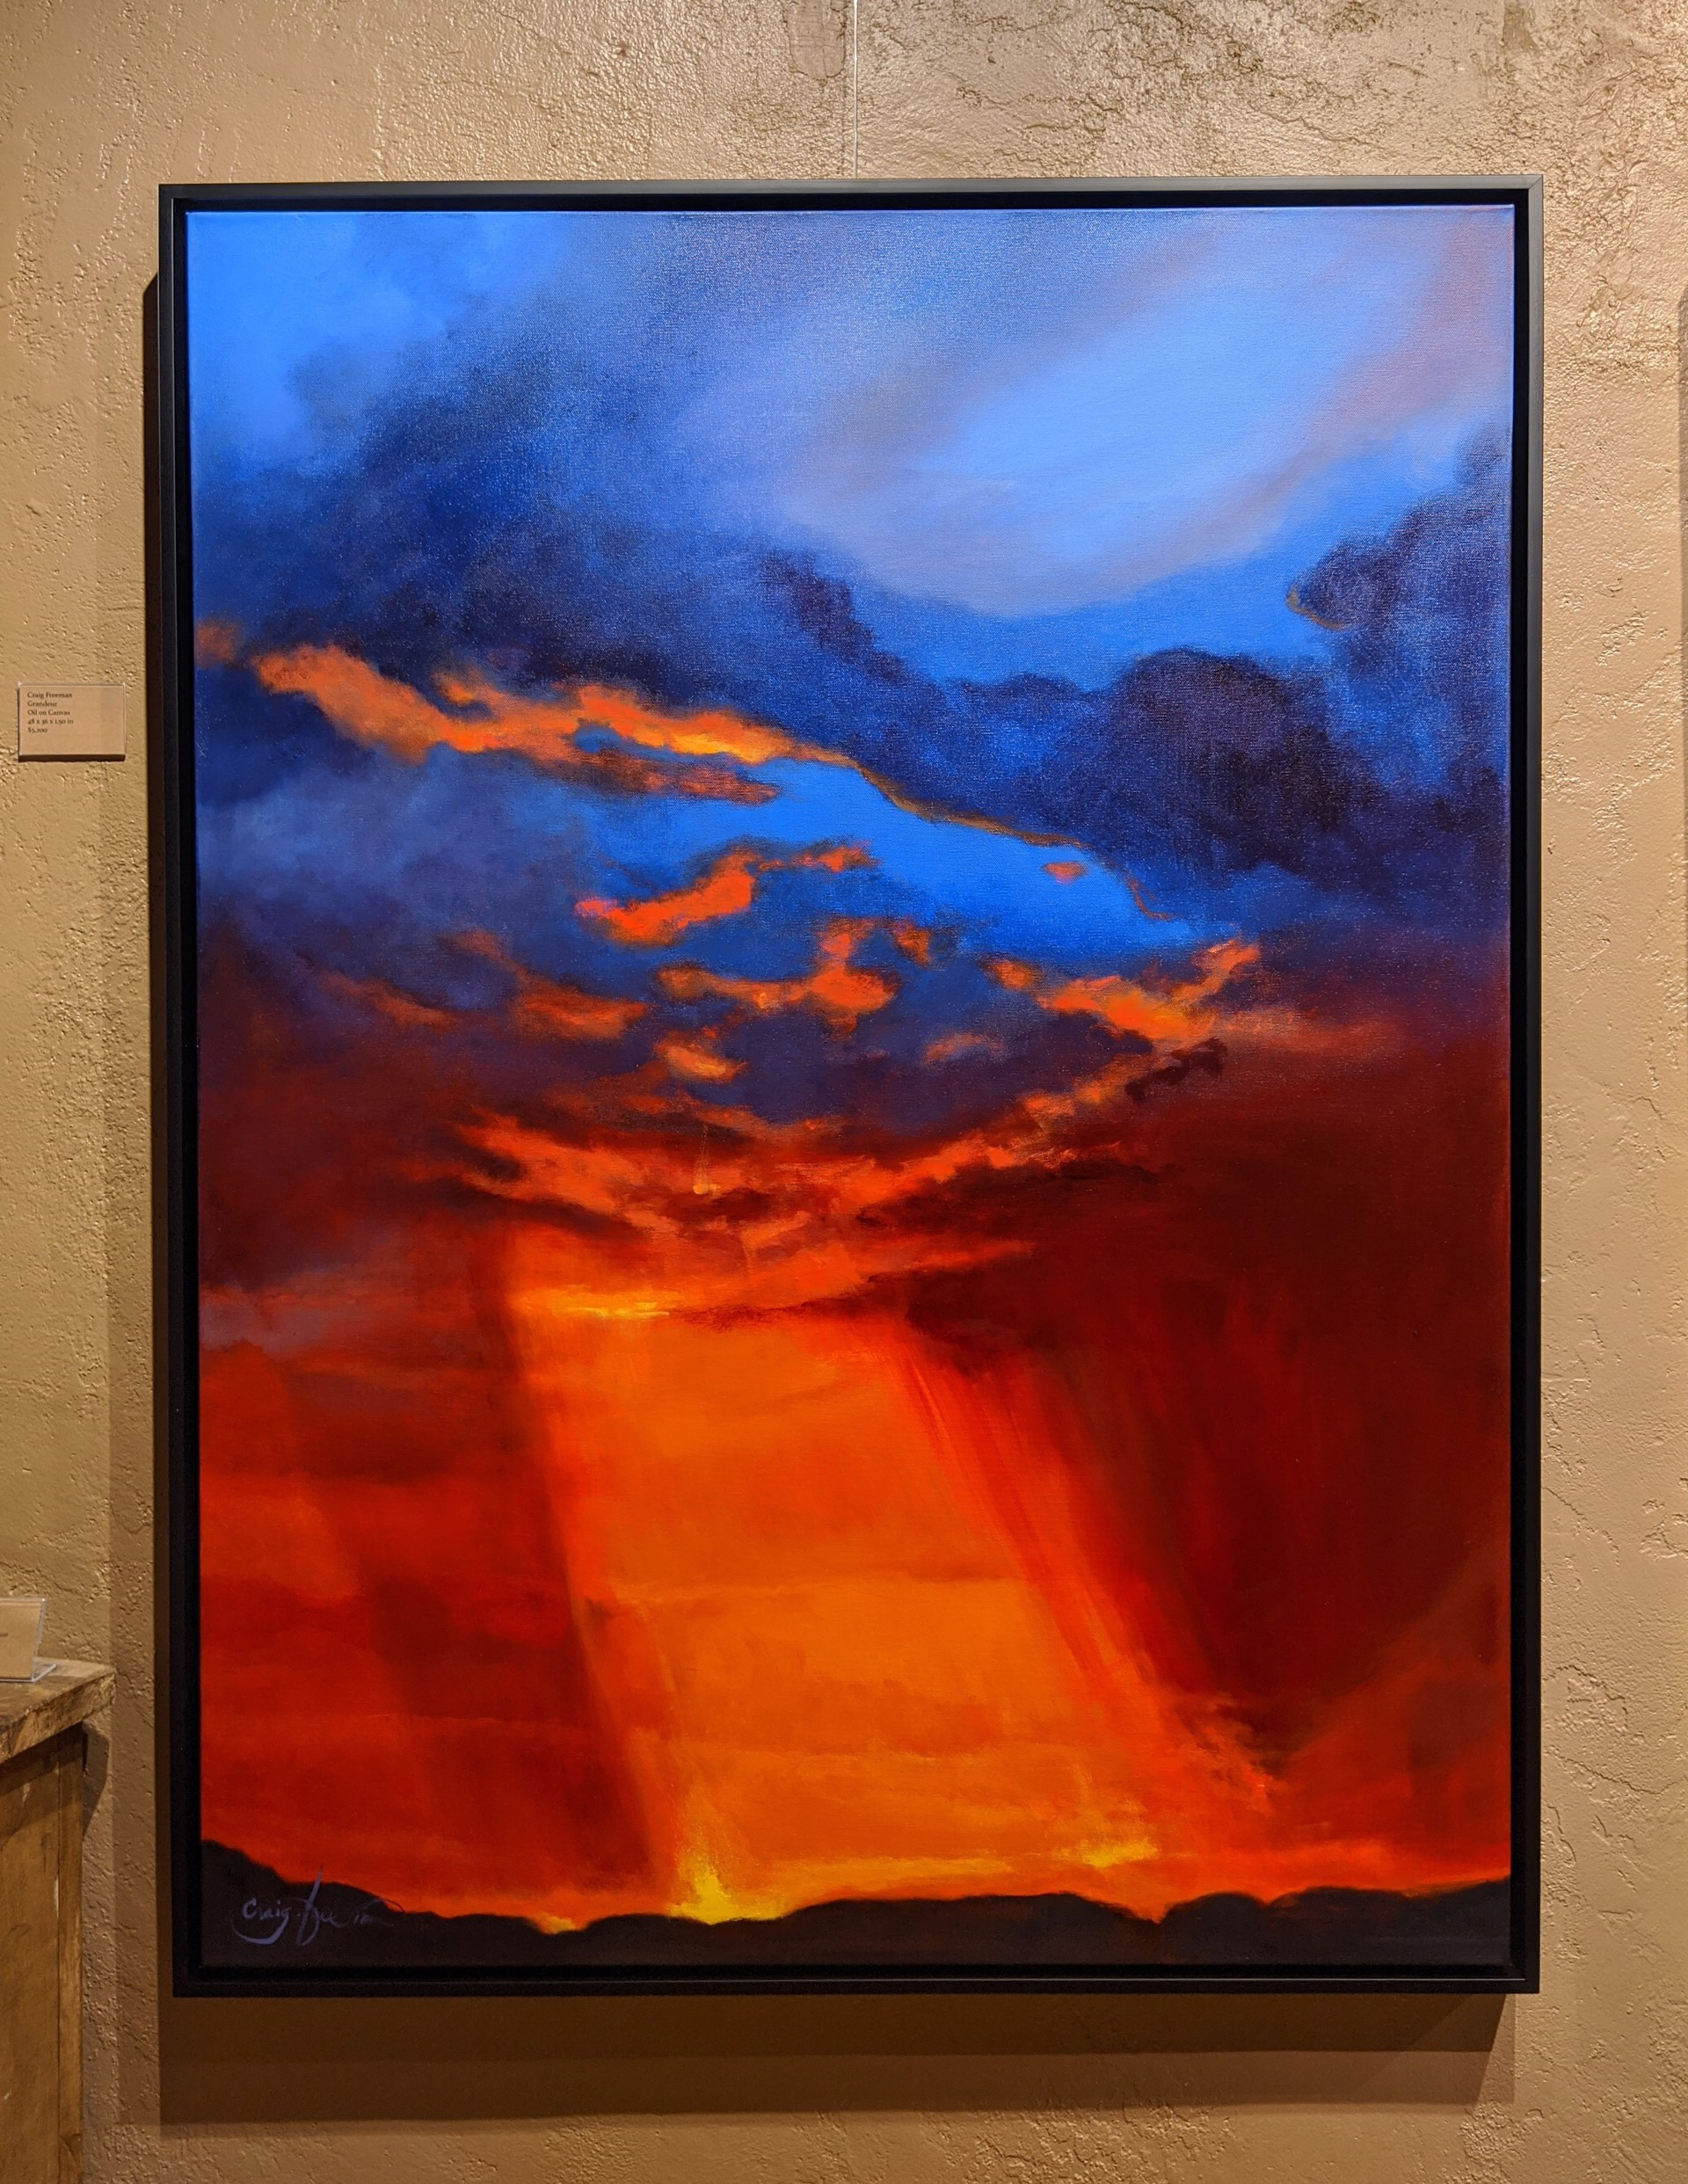 Pillar of Light II by Craig Freeman